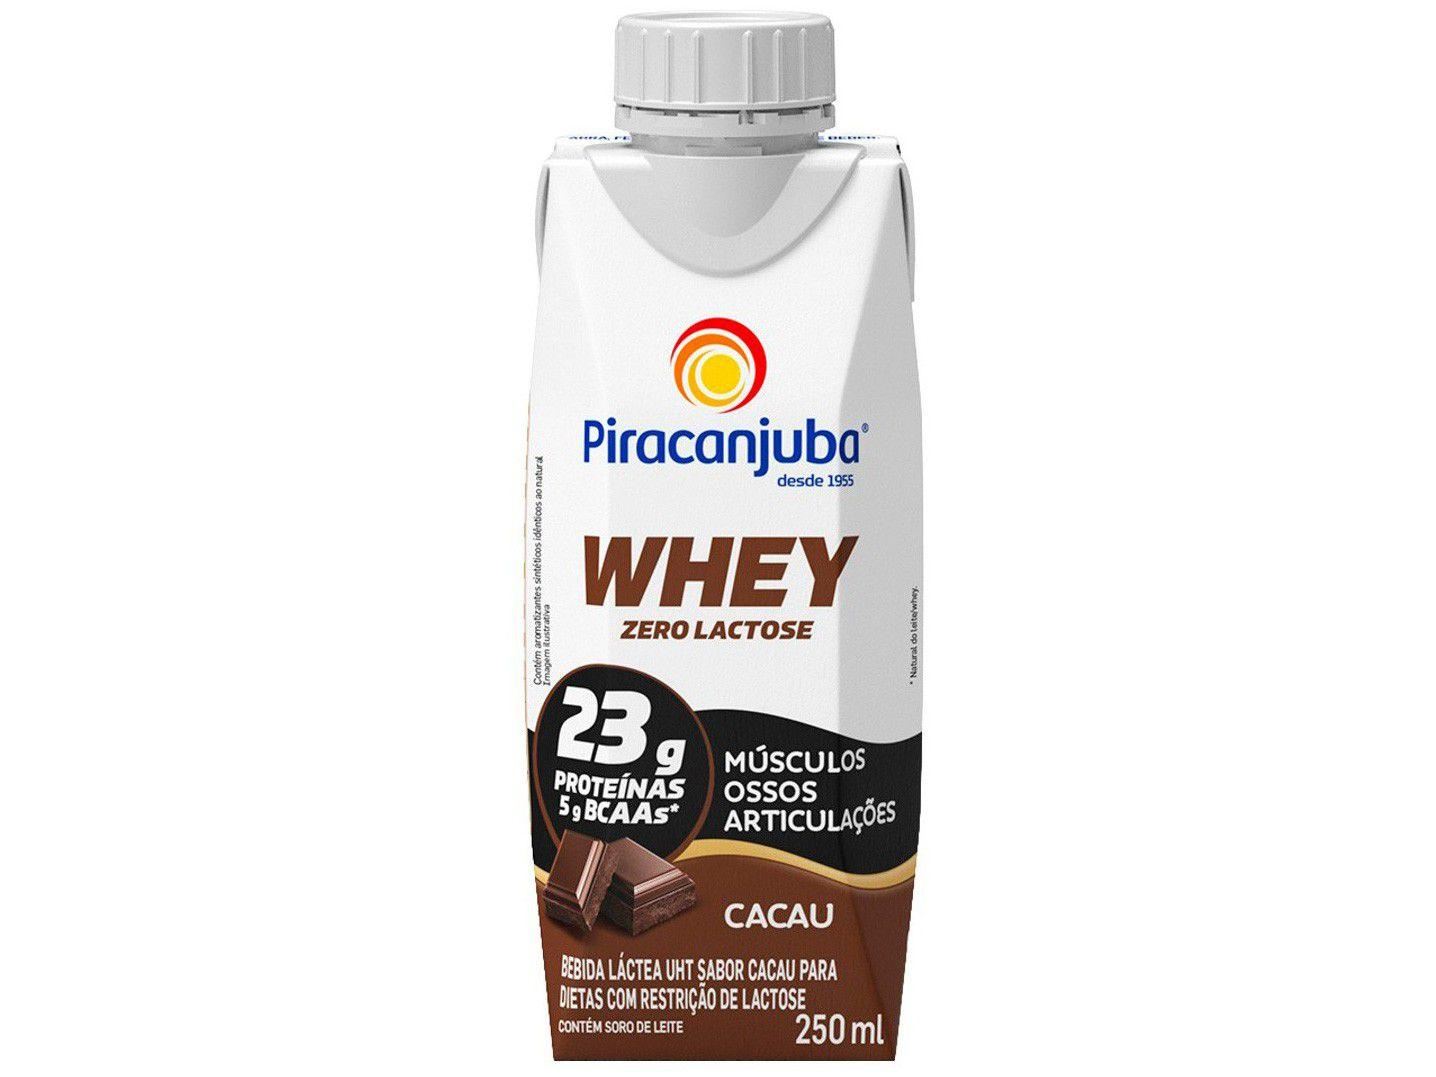 Bebida Láctea Piracanjuba Whey Cacau Zero Lactose - 250ml